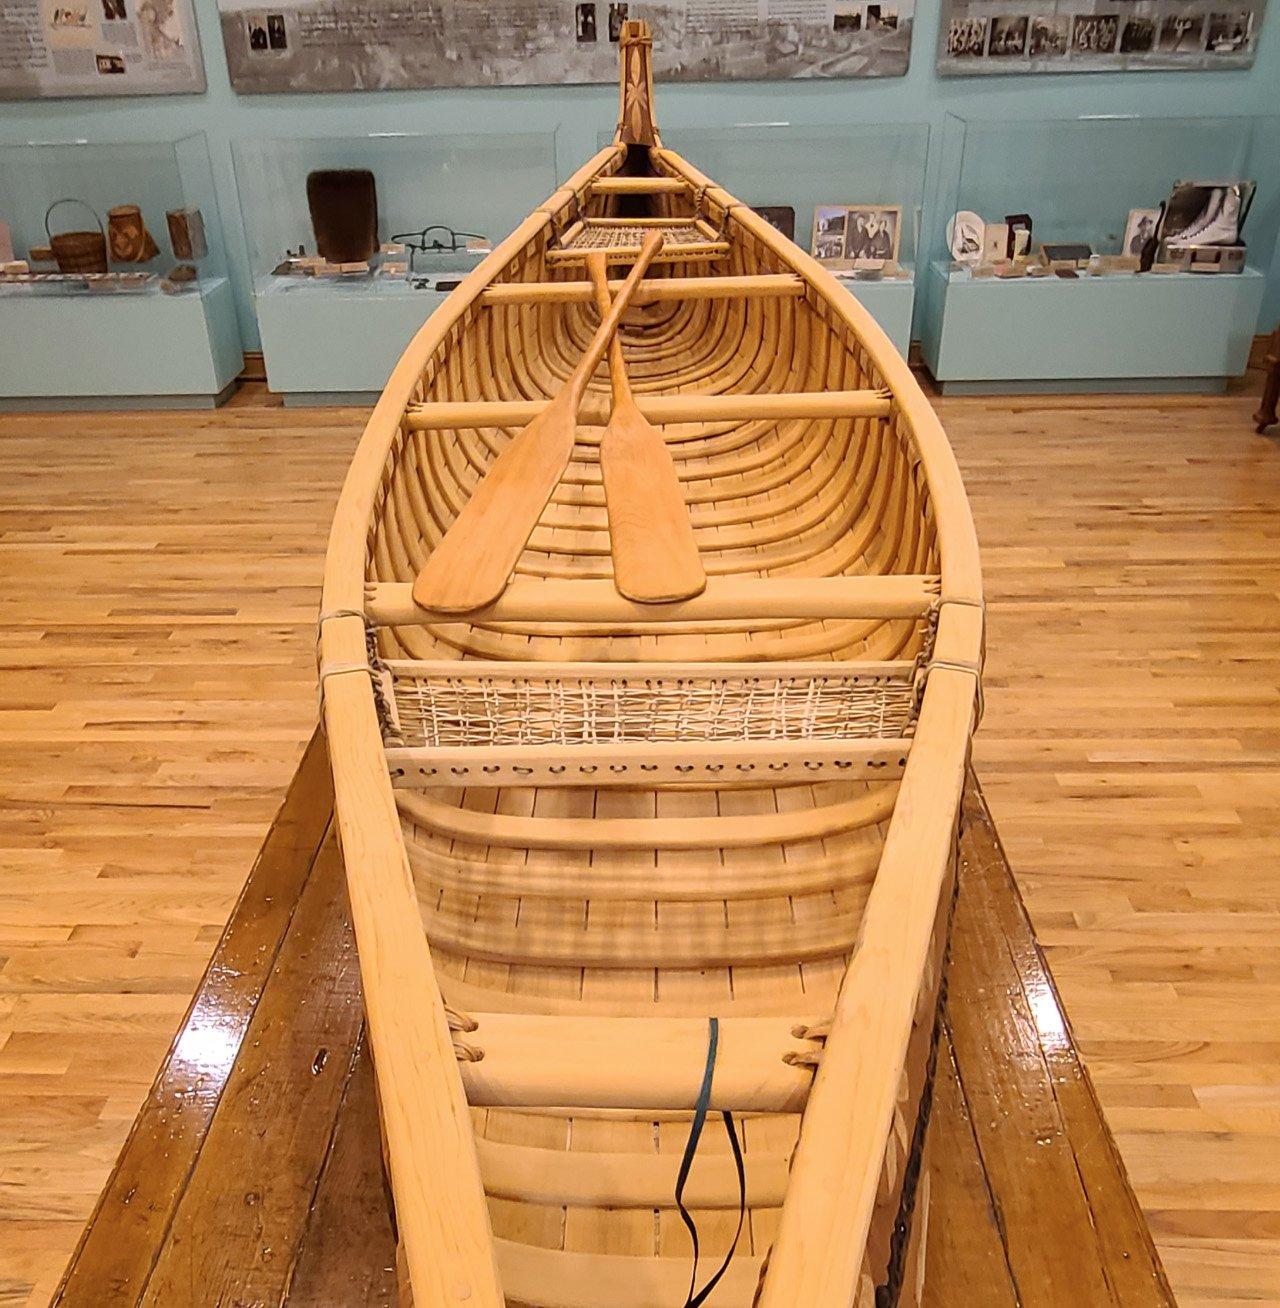 Traditional Anishinaabe birchbark canoe created by Red Cliff Elder, Marvin Defoe